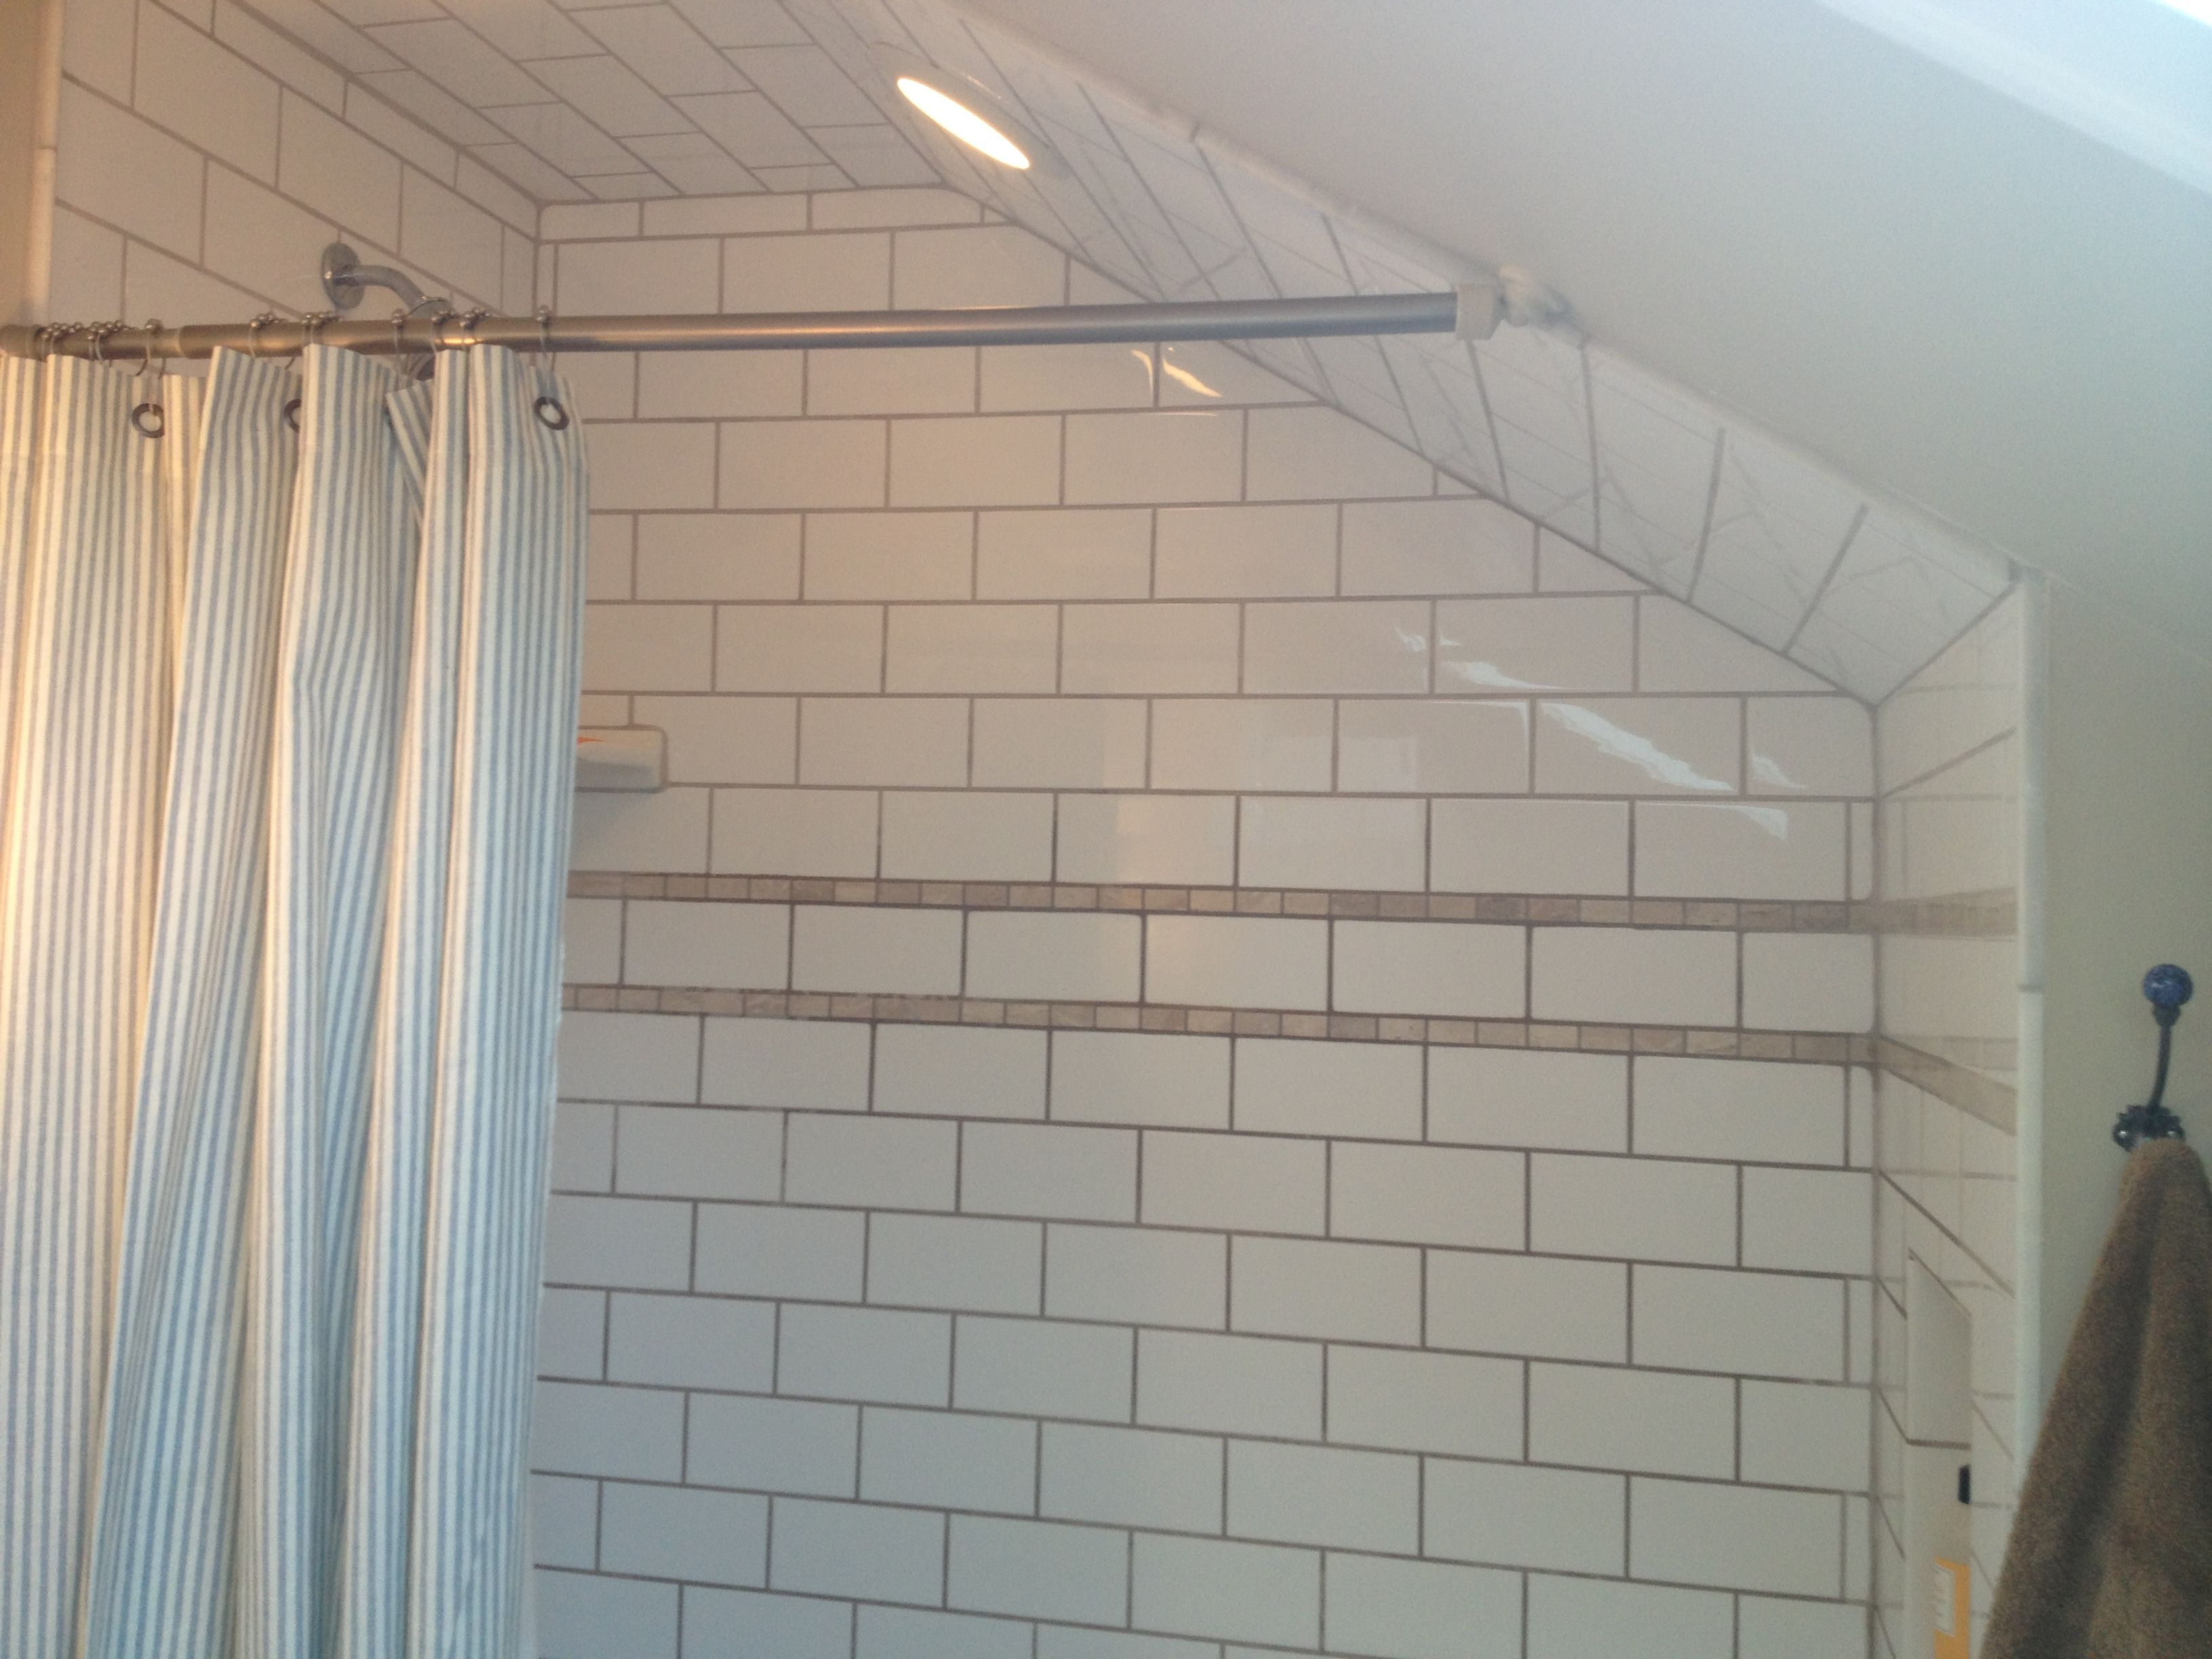 attic bathroom...slanted ceiling | Bathrooms | Pinterest | Slanted on slanted wall decoration ideas, slanted wall bedroom, tilted wall bathroom designs,